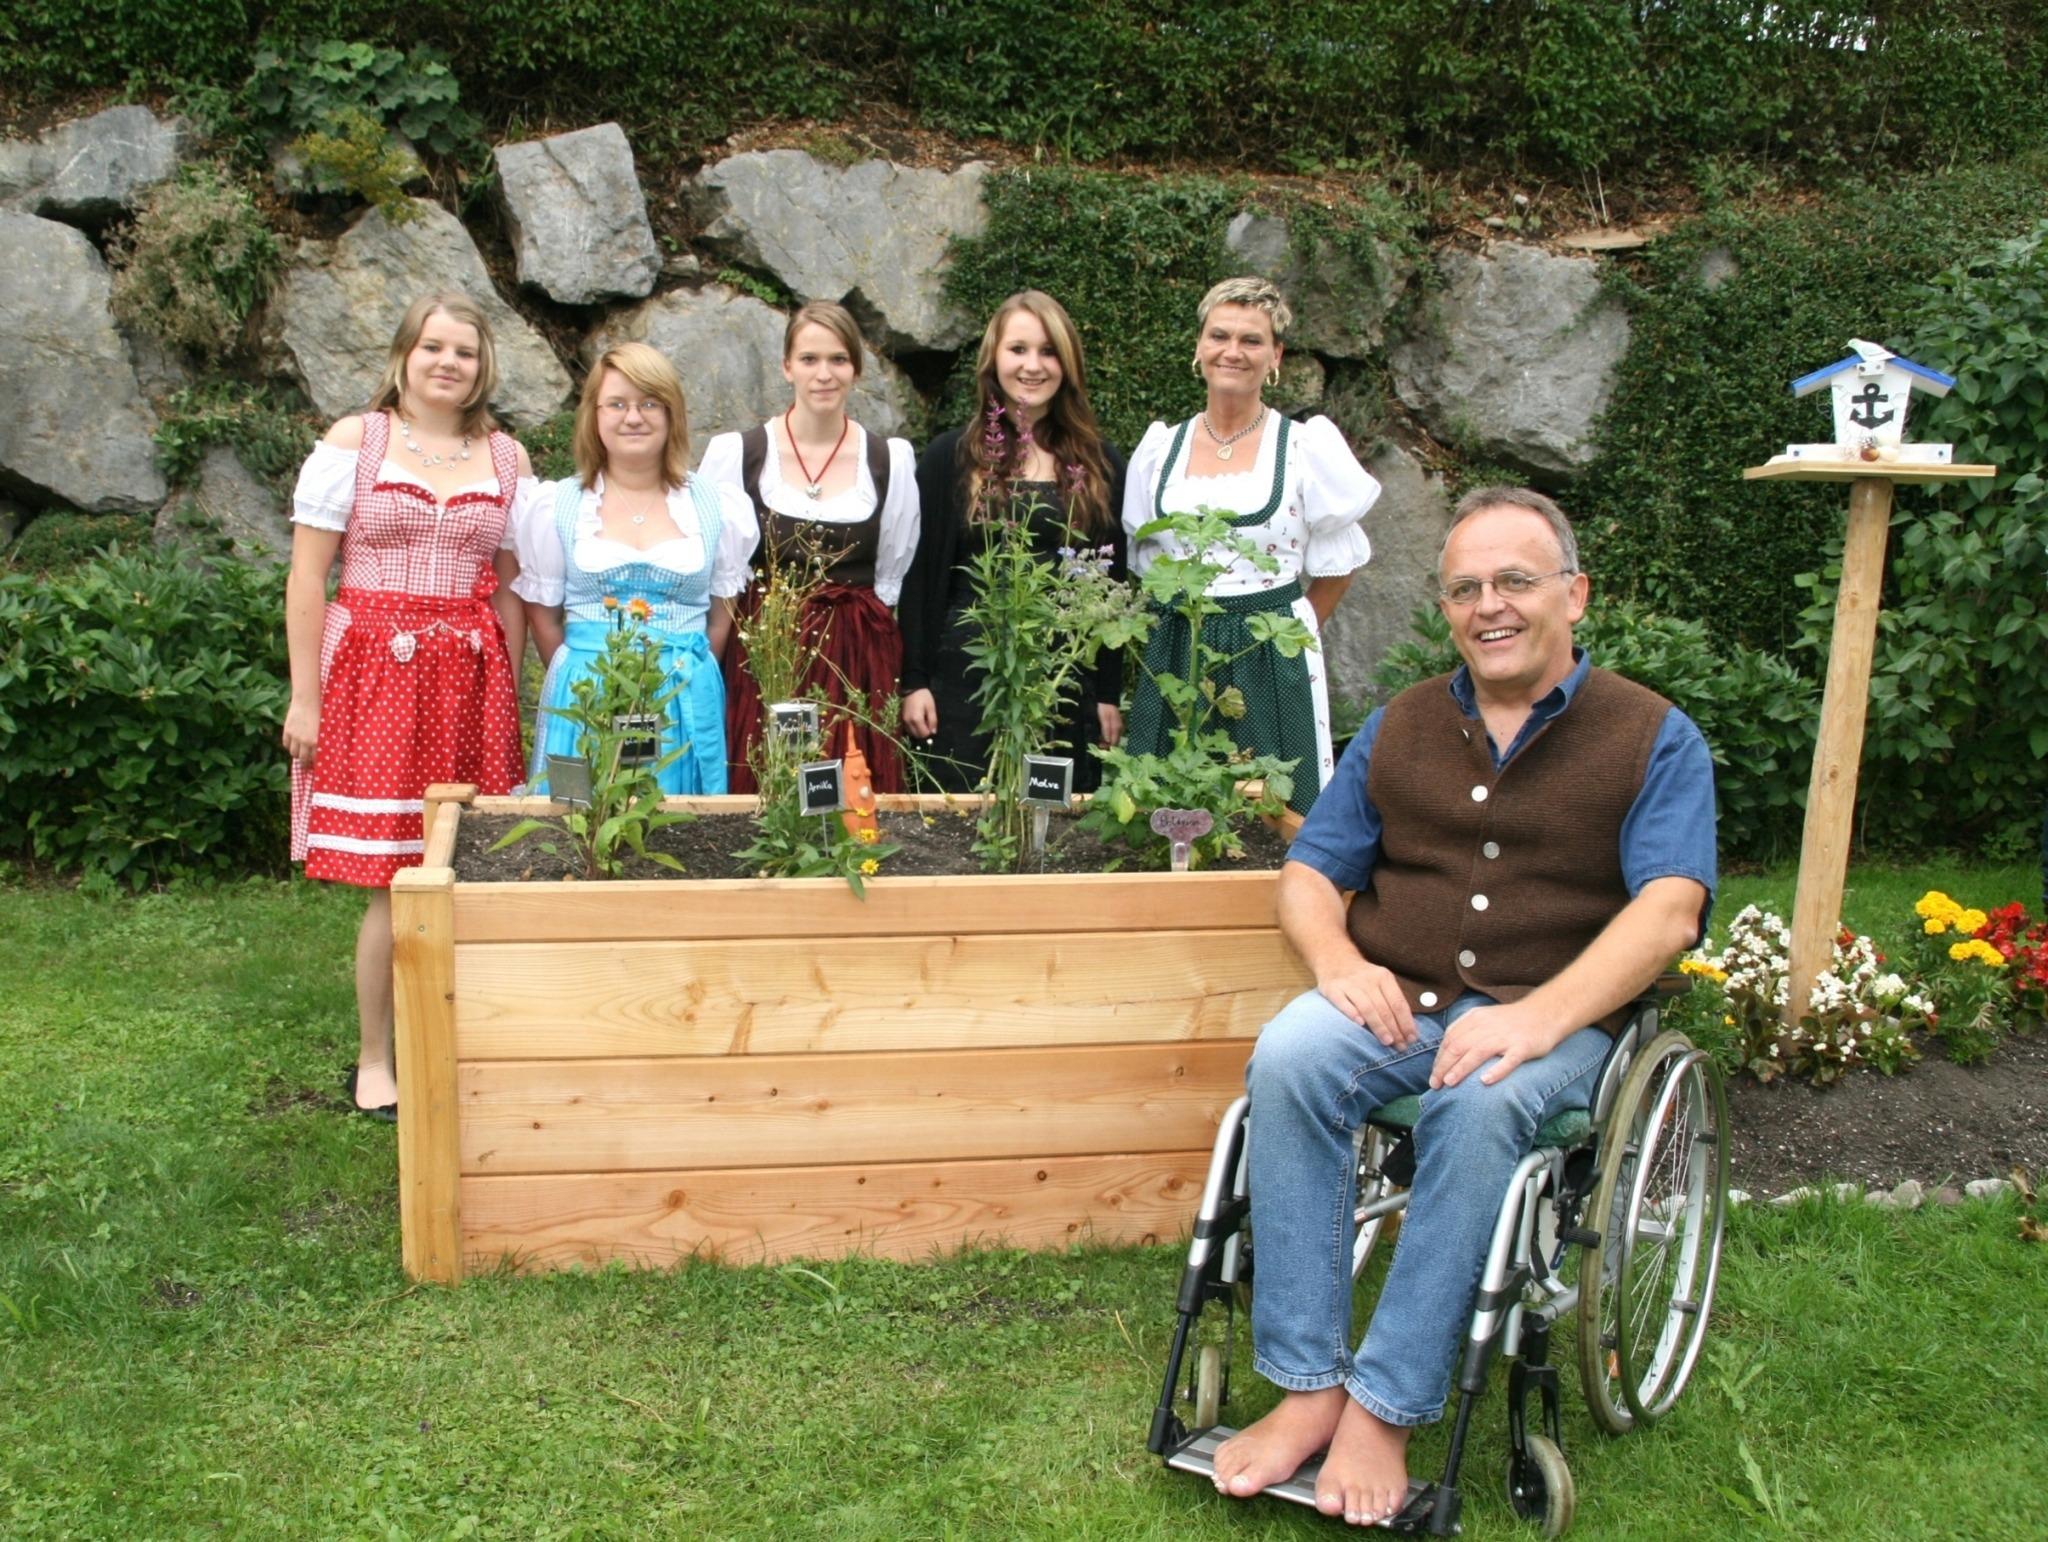 Bekanntschaften in Kirchbichl - Partnersuche & Kontakte